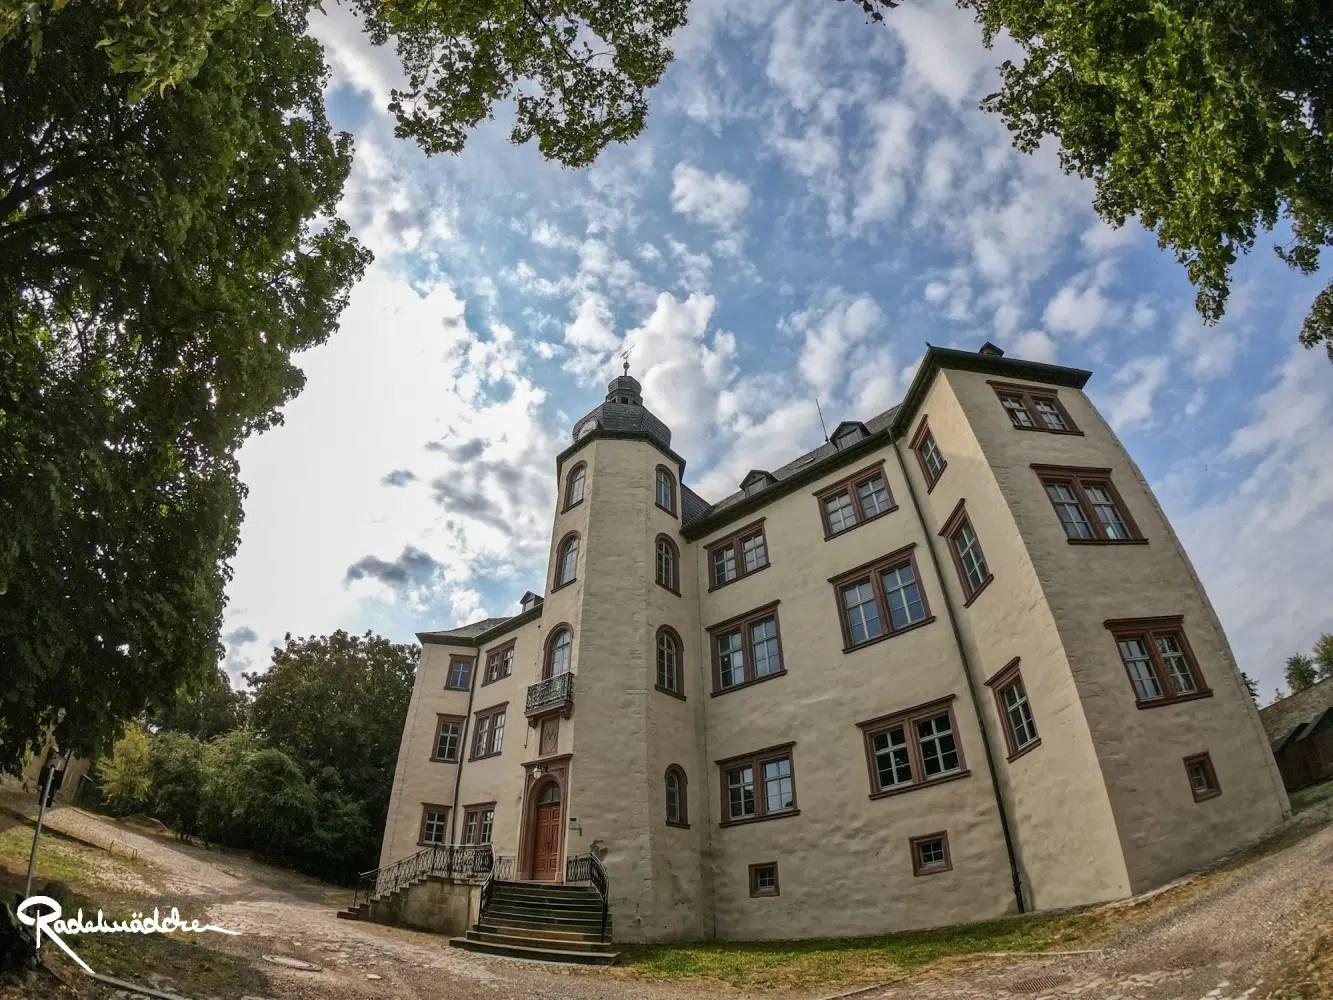 Unstrutradweg_Schloss_ wiehe